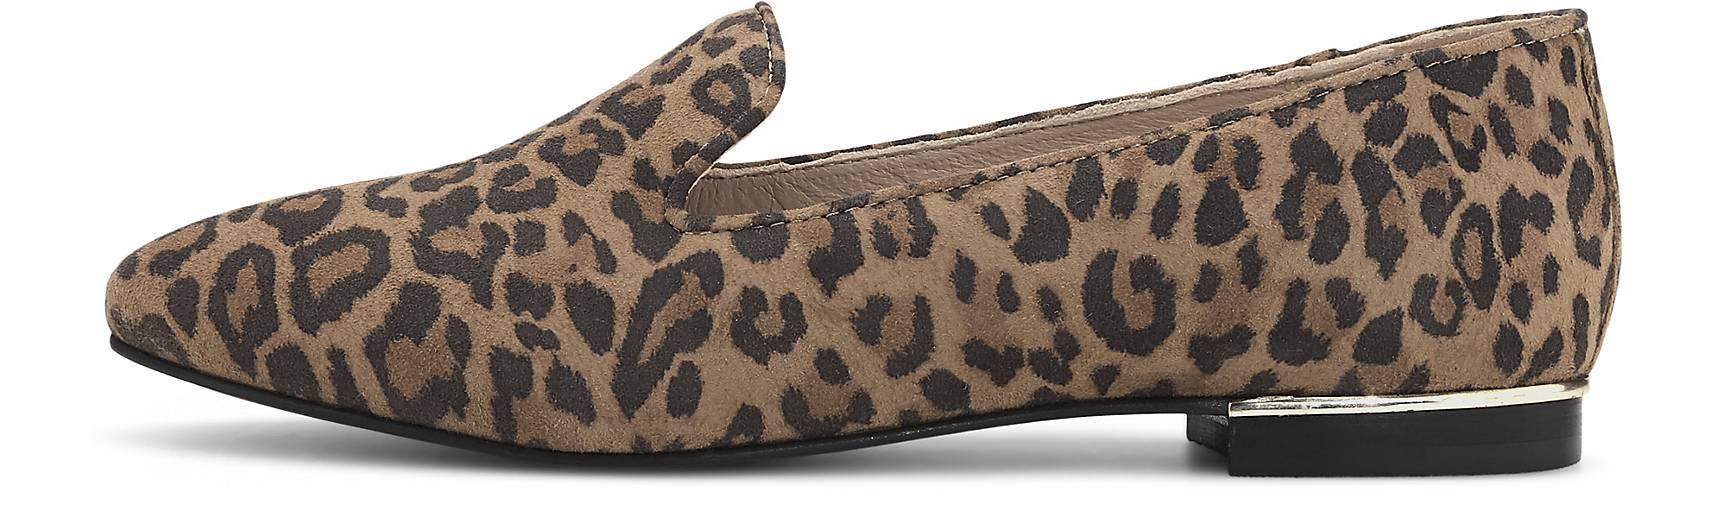 COX Fashion-Slipper